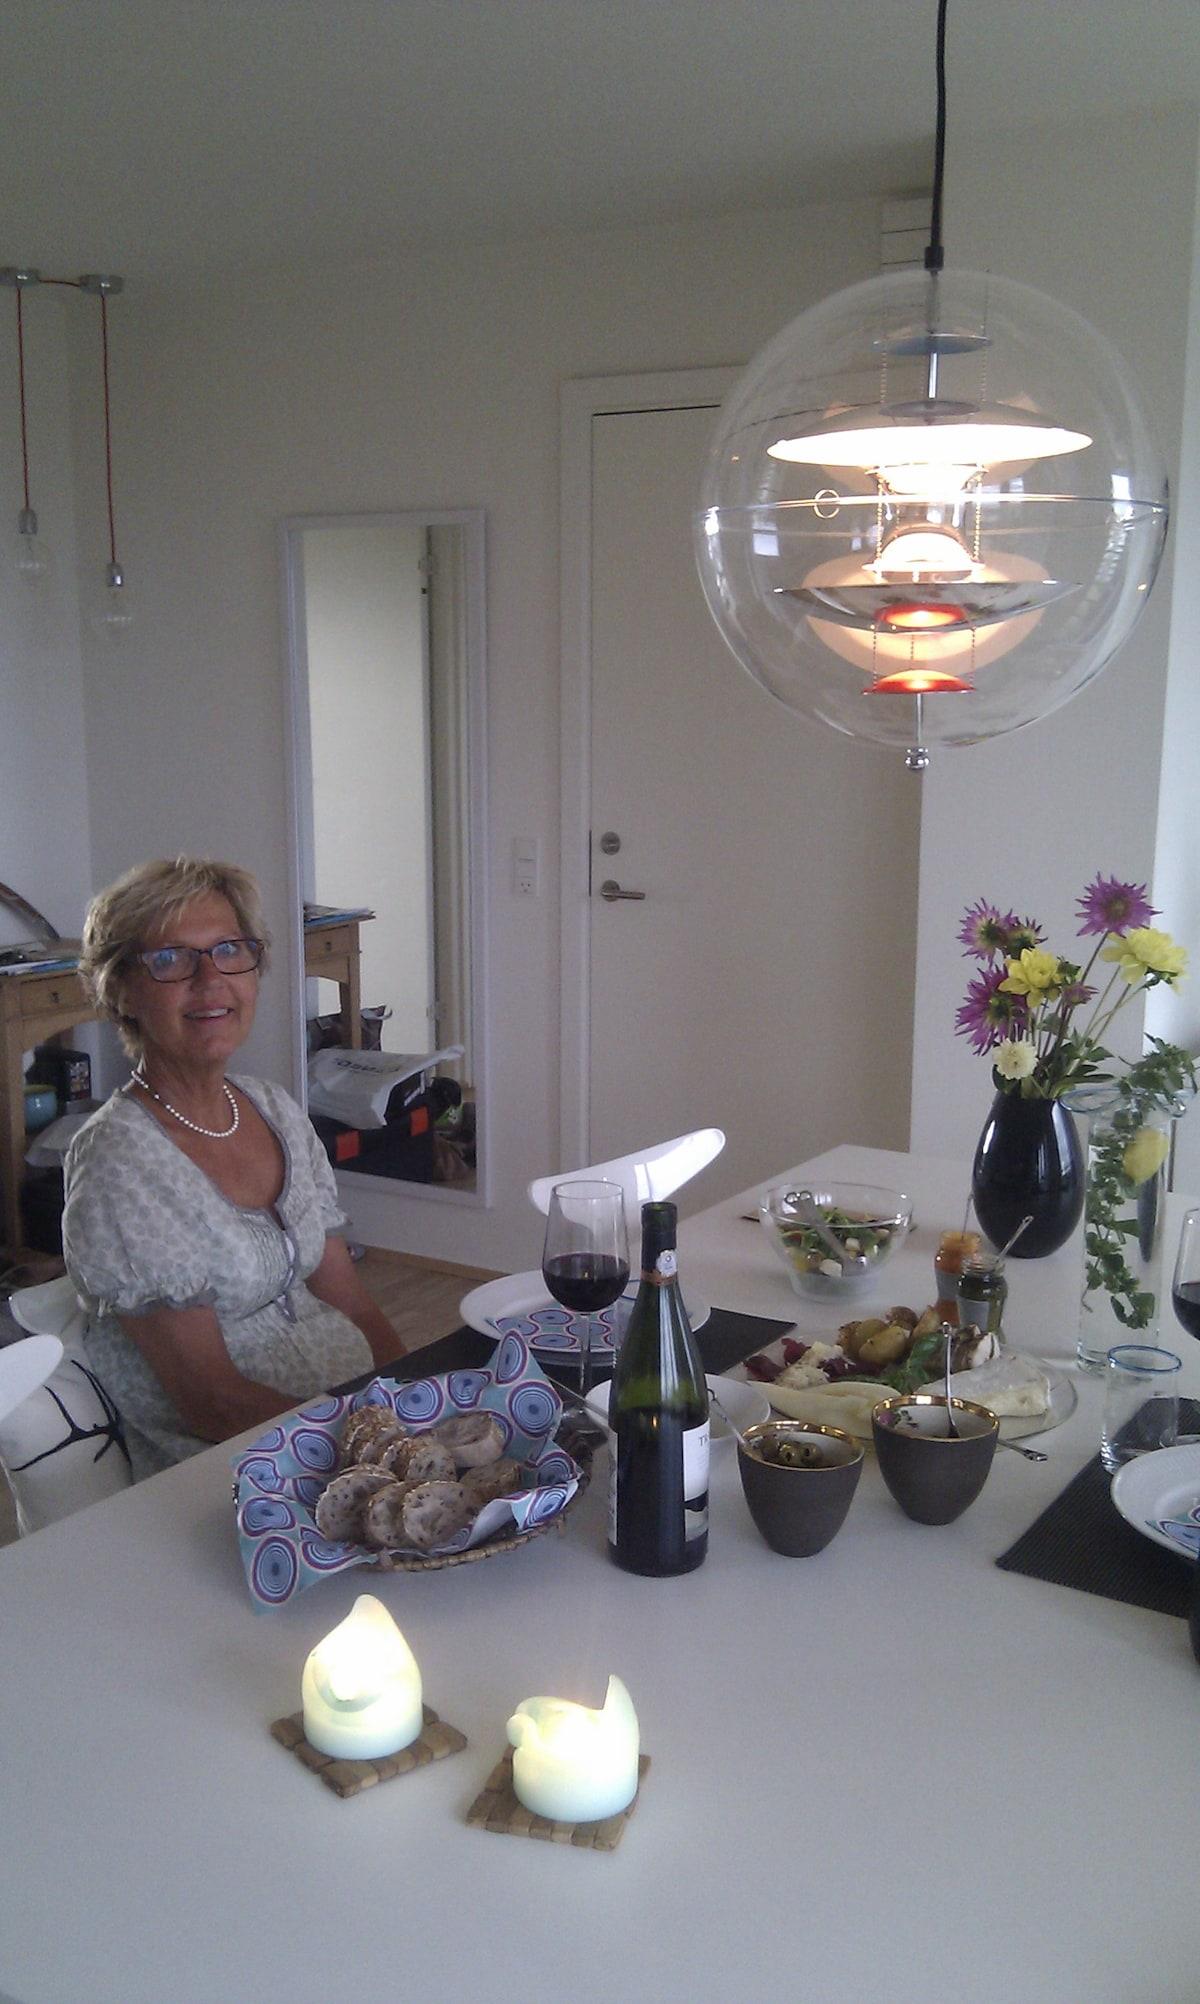 Annelise From Pandrup, Denmark